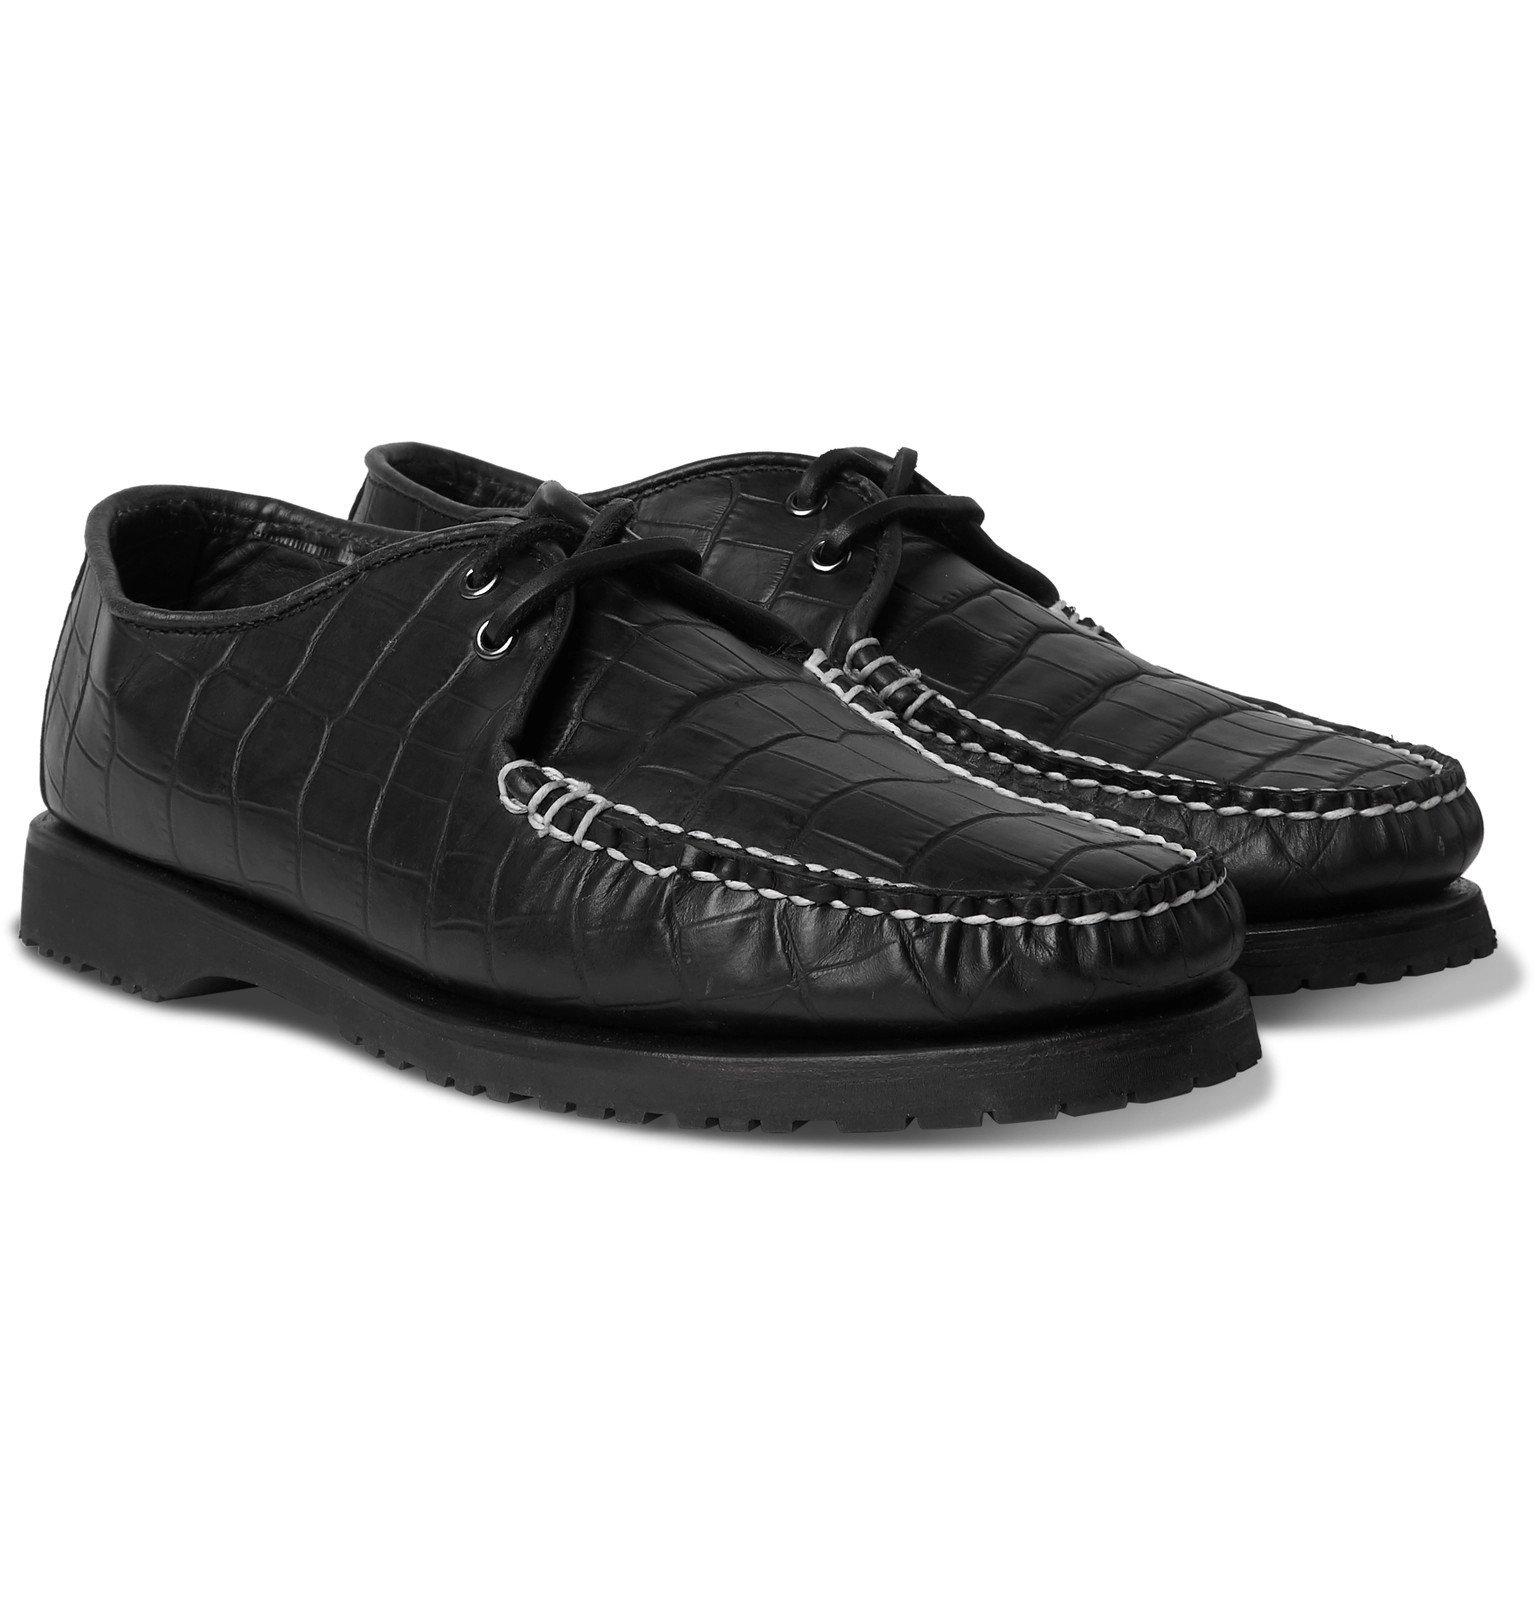 Photo: Noah - Sperry The Captain's Oxford Croc-Effect Leather Shoes - Black